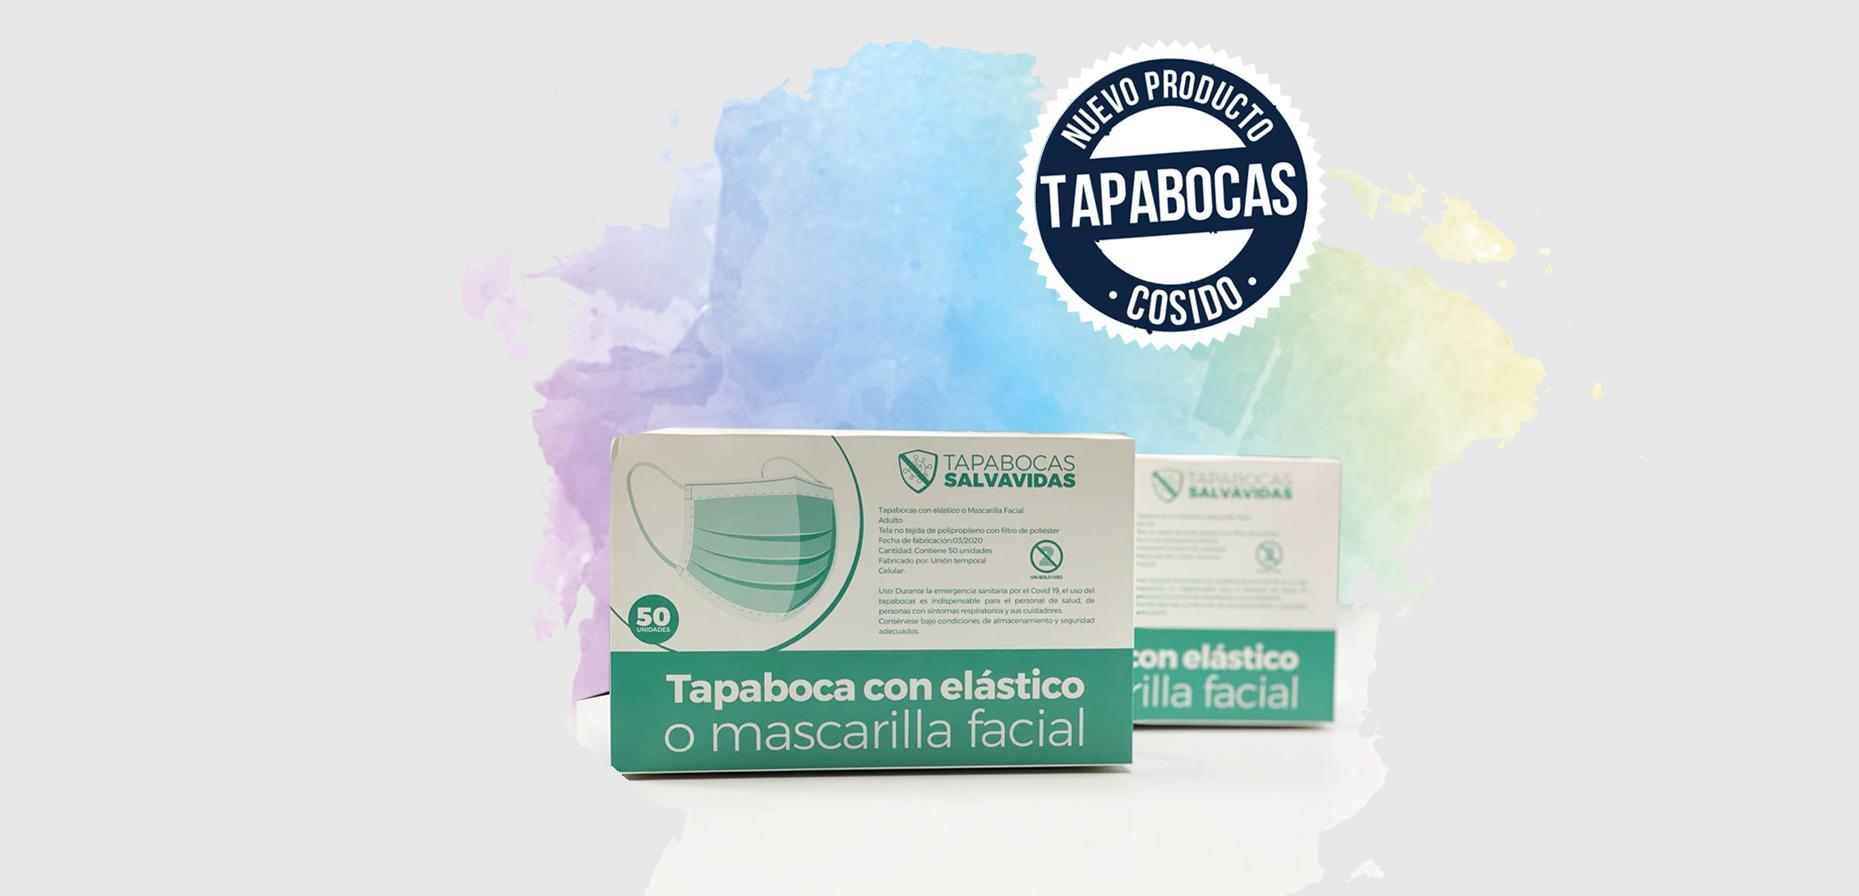 tejidos-totas-tapabocas-bioseguridad-2